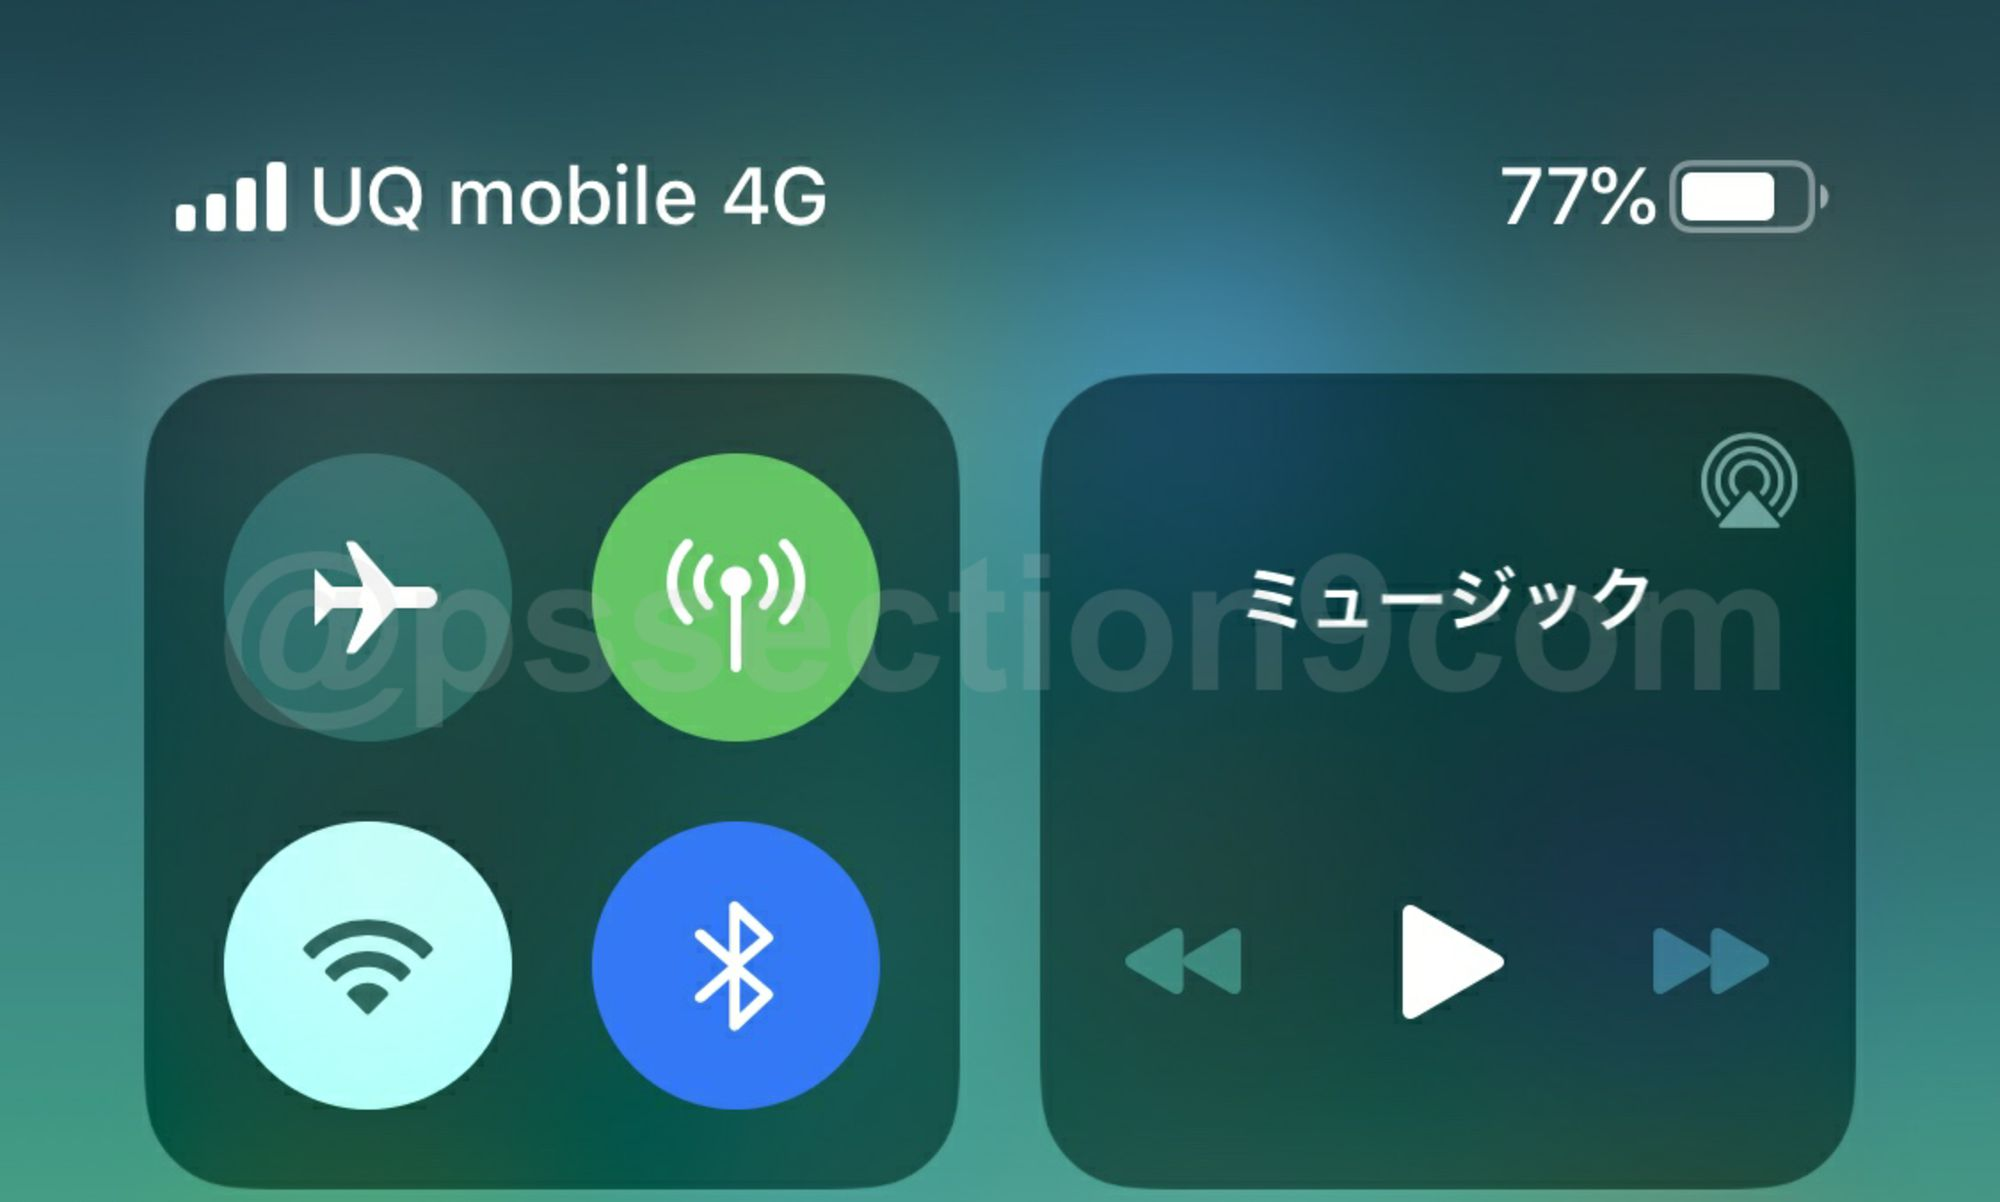 Iphone12 uq モバイル